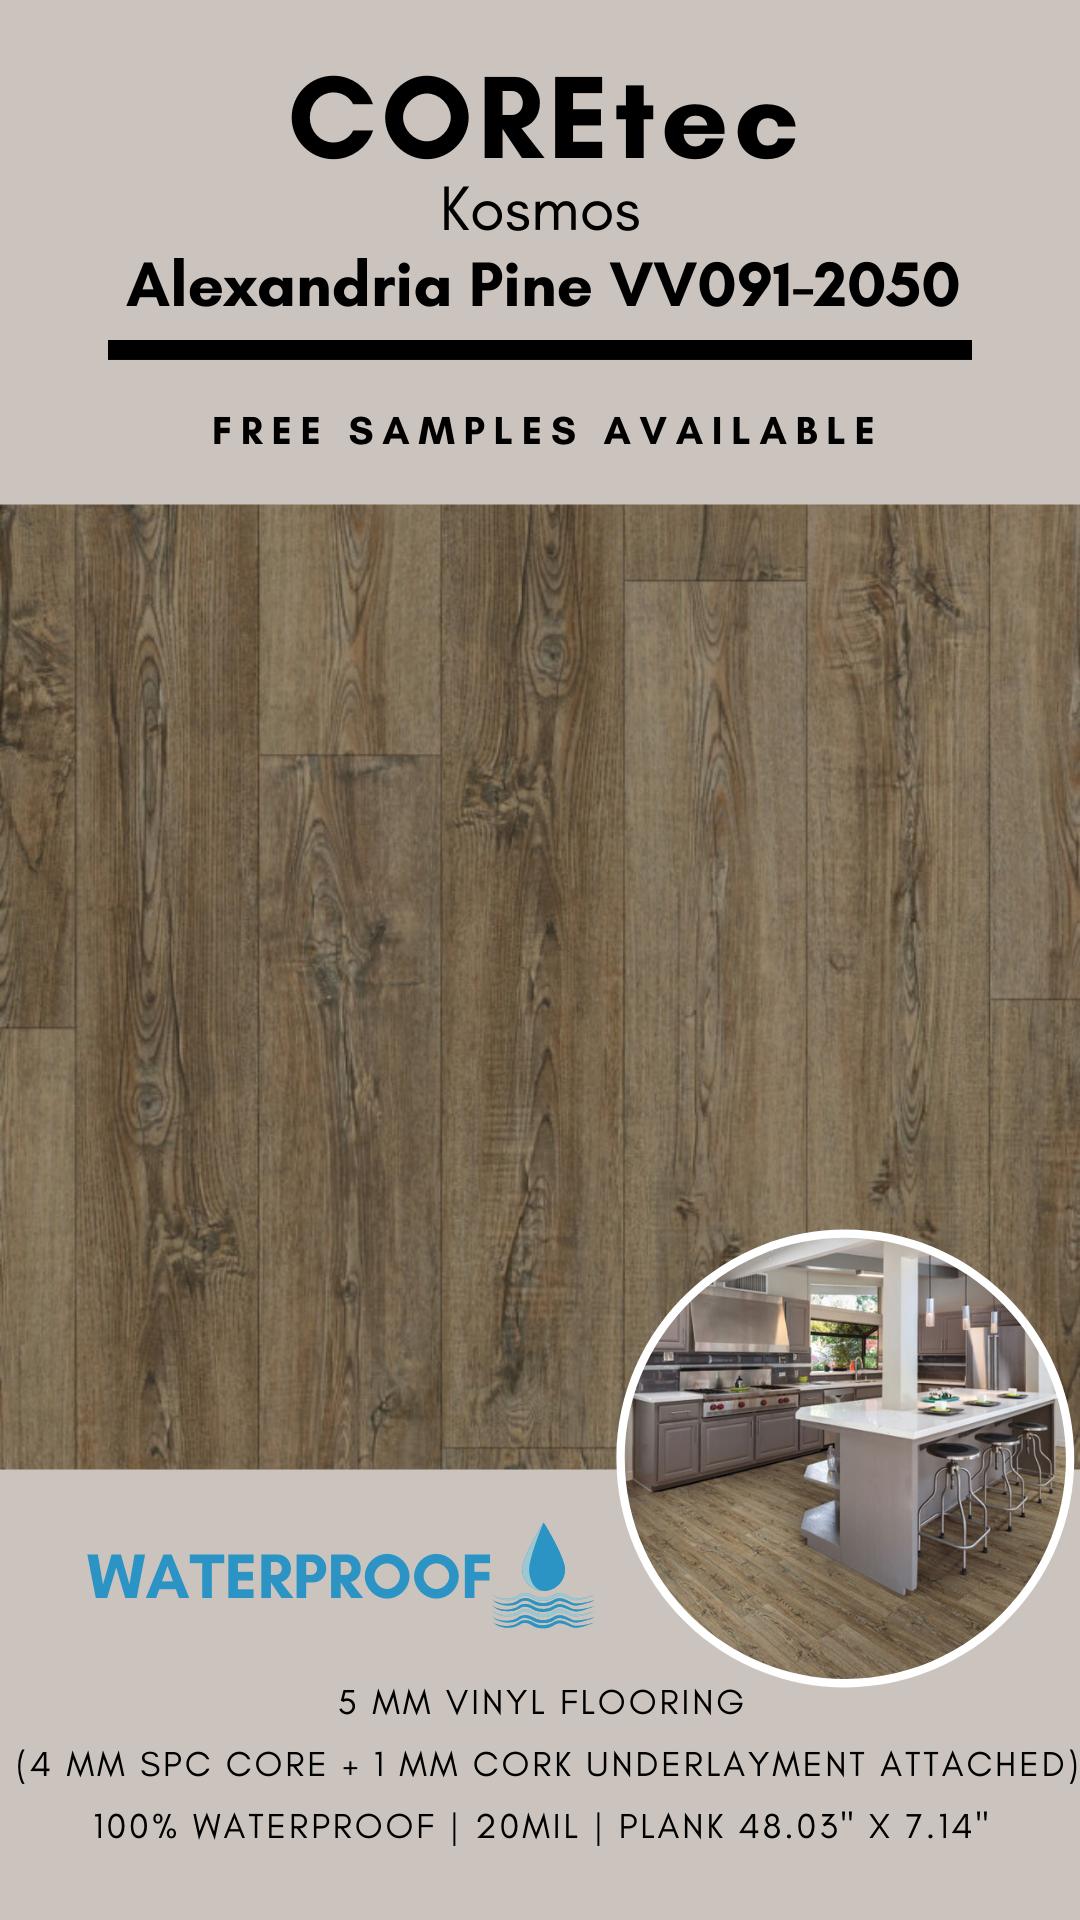 Coretec Kosmos Alexandria Pine Vv091 2050 Spc Vinyl Flooring In 2020 Vinyl Flooring Cork Underlayment Flooring